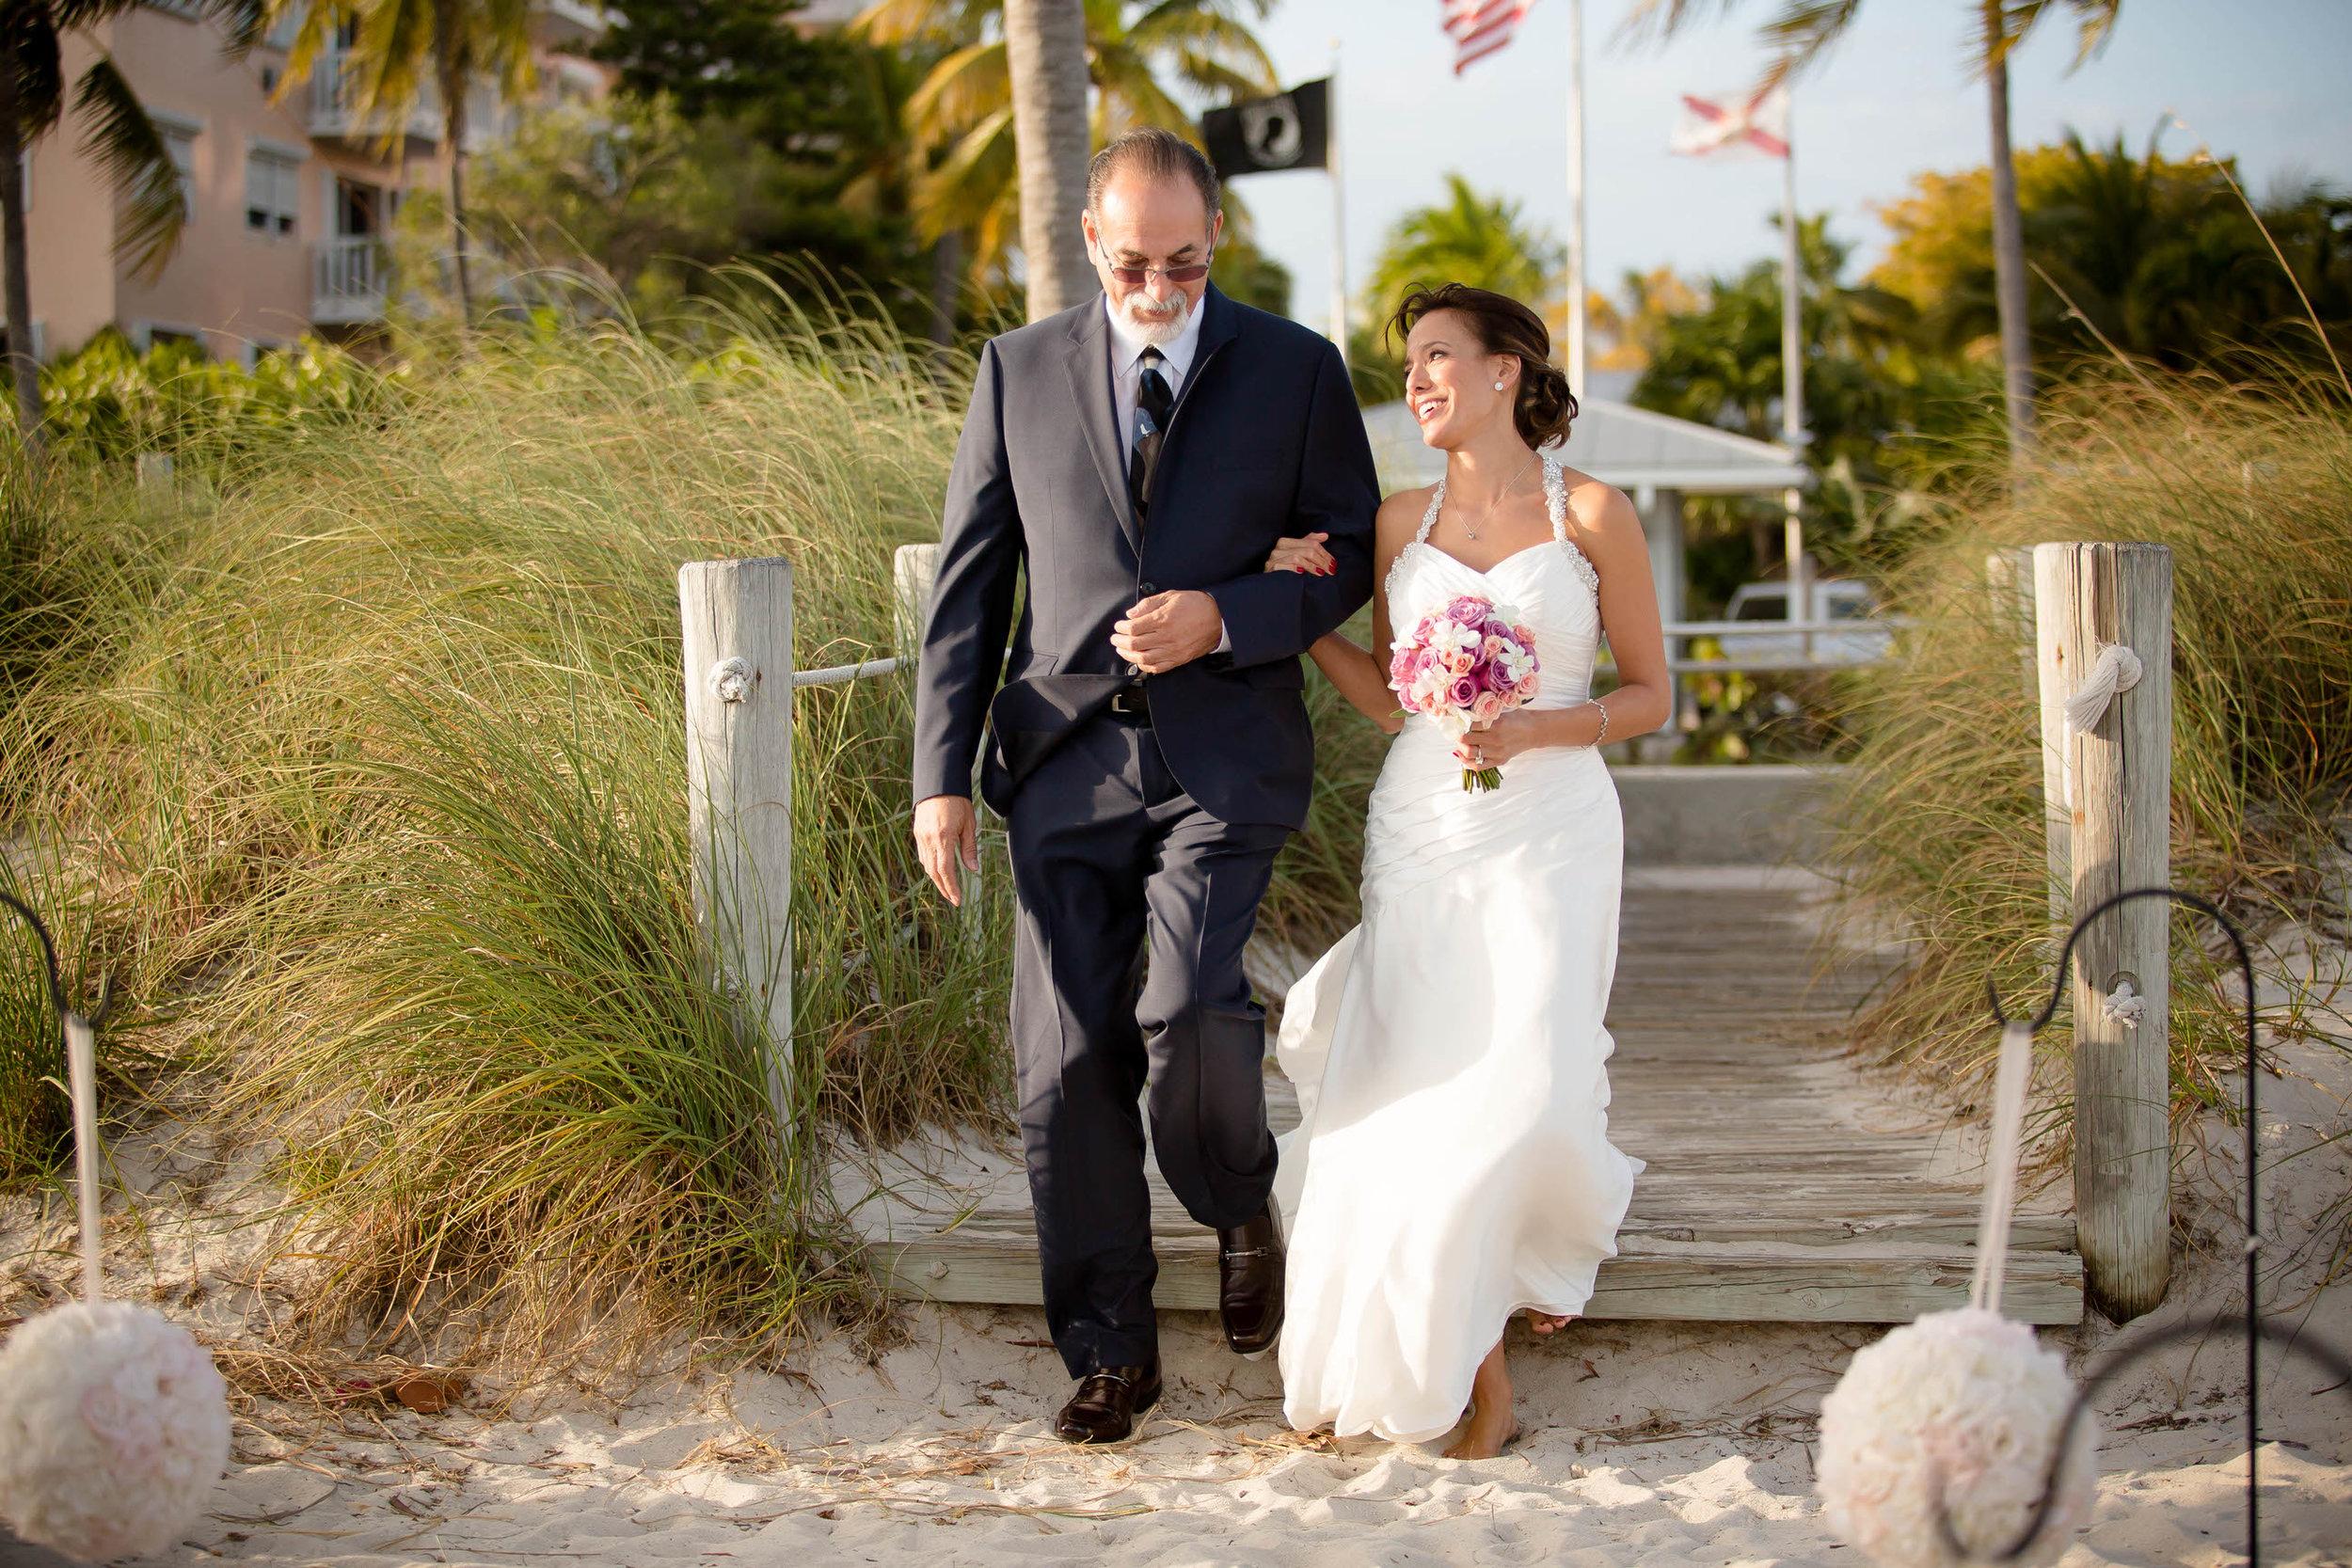 dad_walking_bride_isle_beach_wedding_tiny_house_photo.jpg